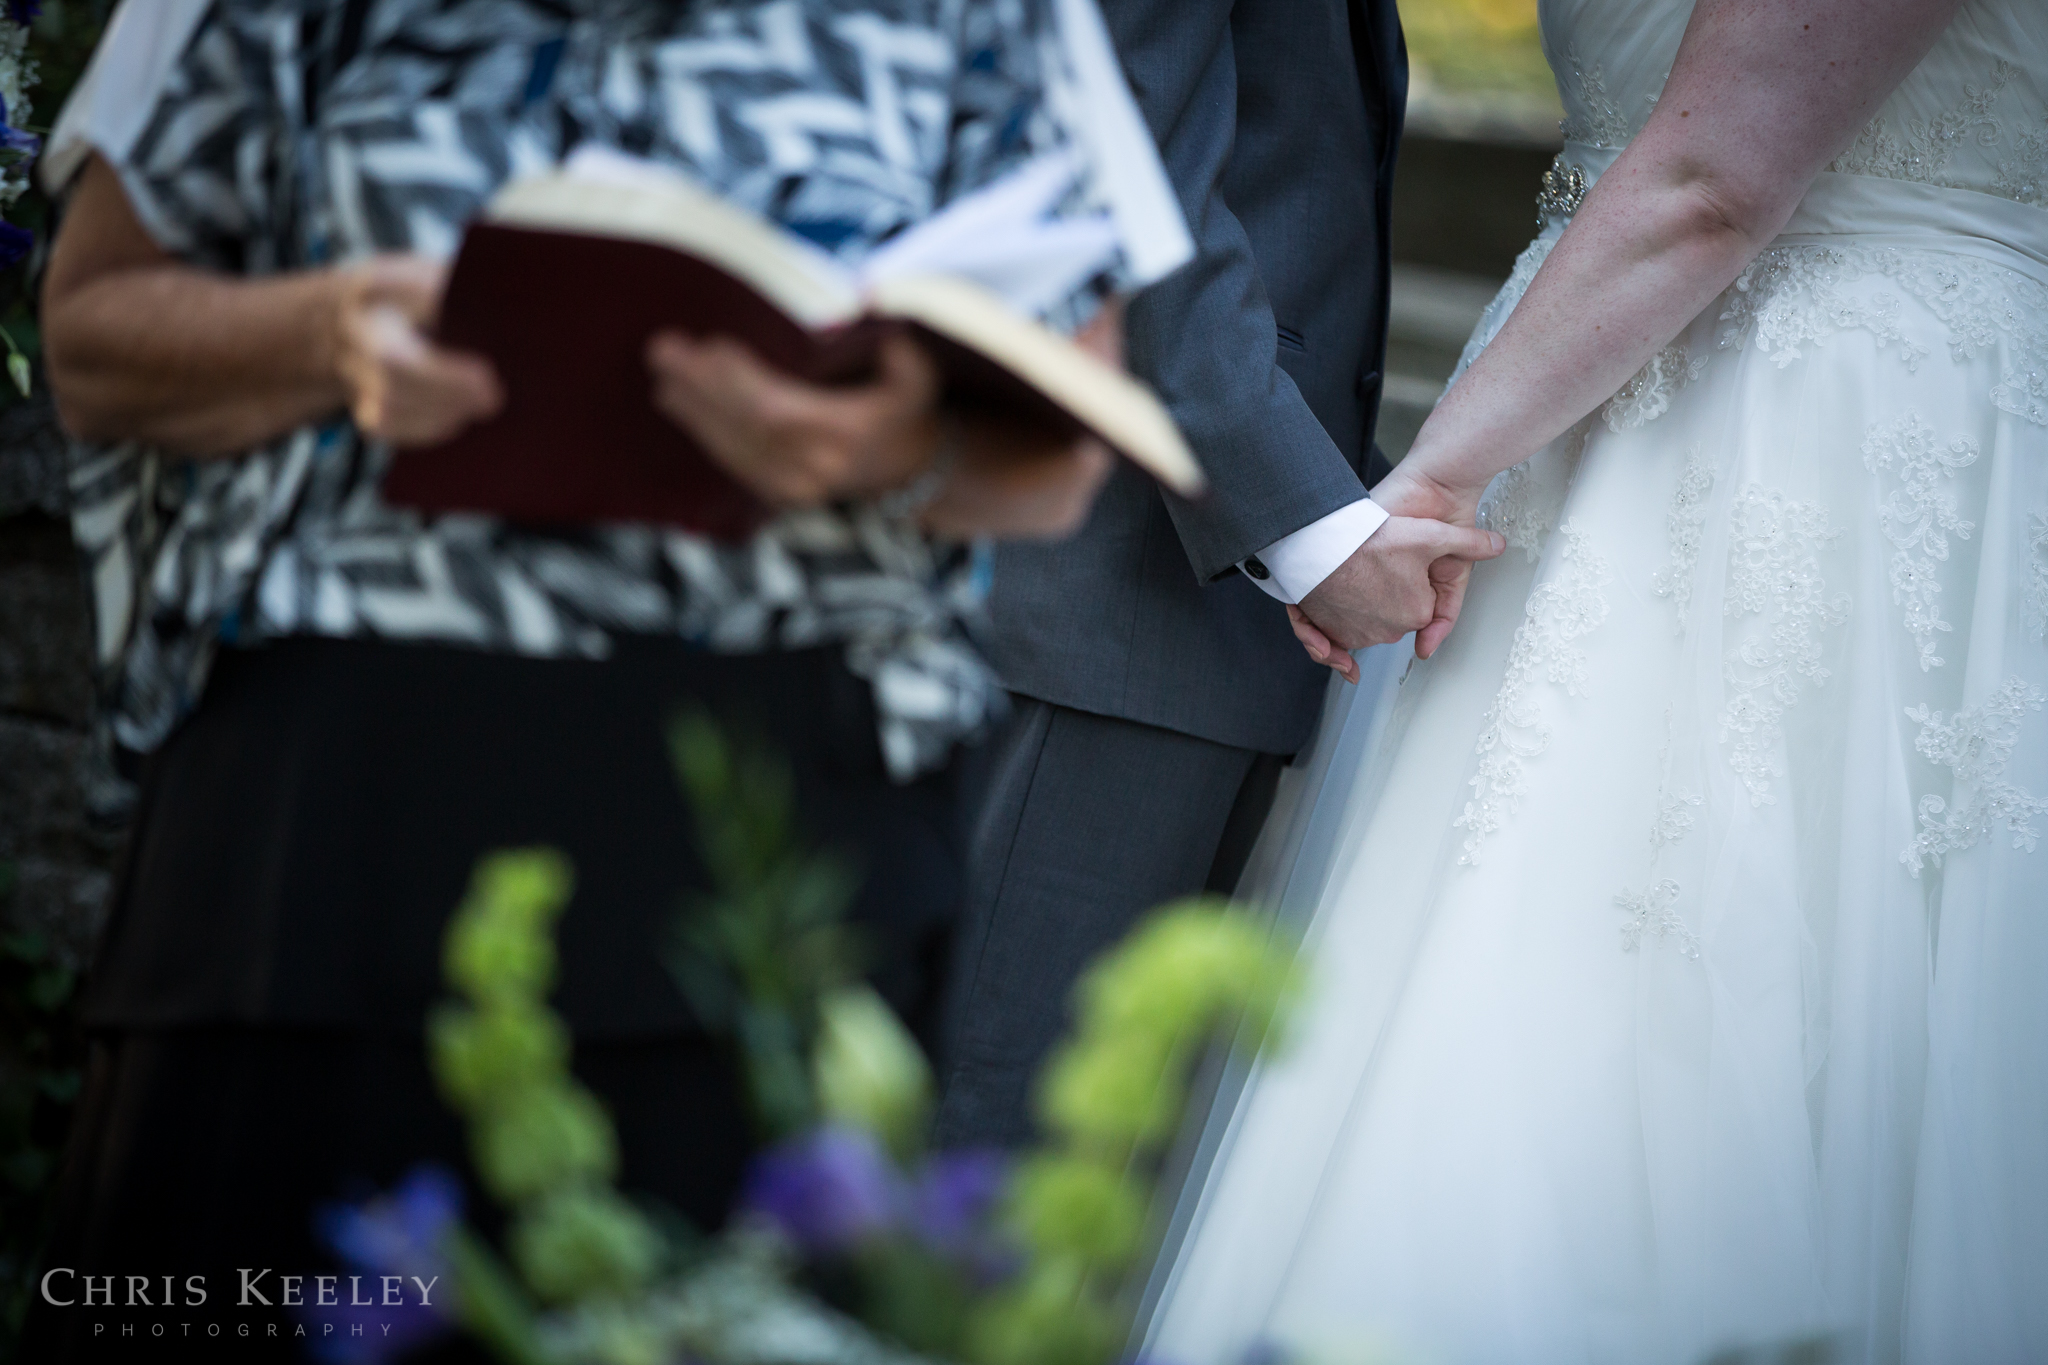 new-hampshire-wedding-photographer-three-chimneys-inn-chris-keeley-photography-18.jpg